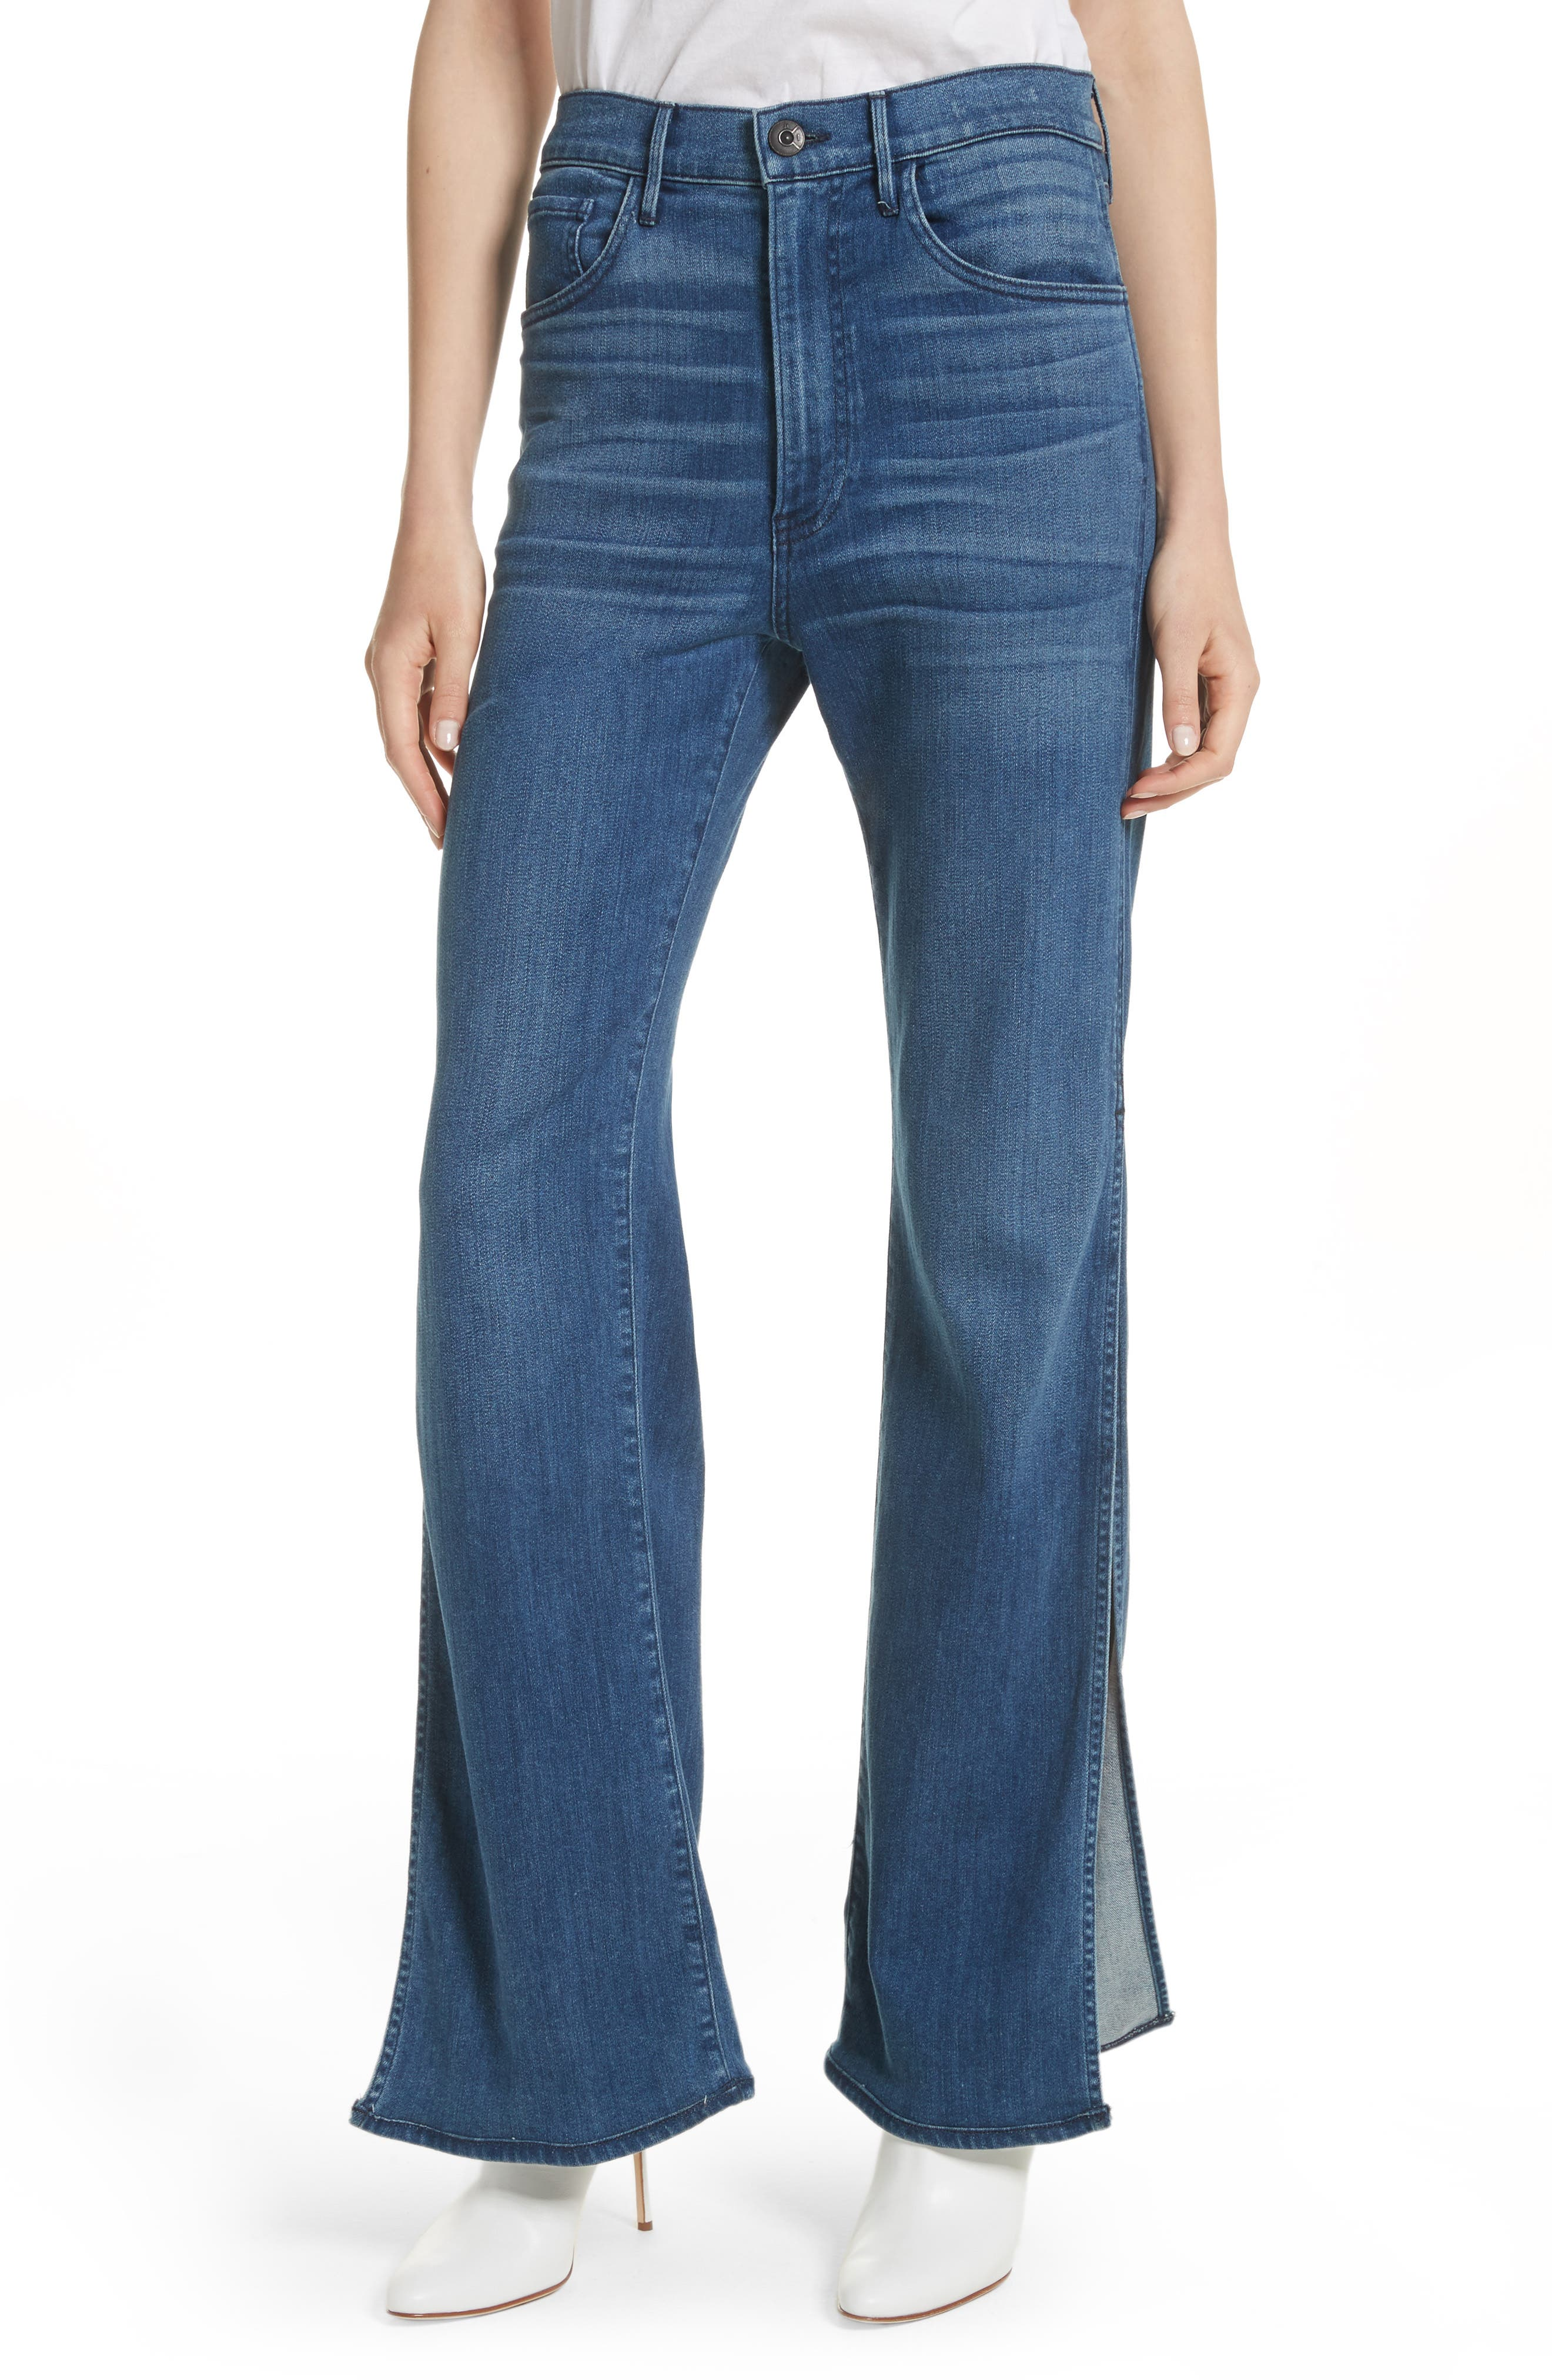 W4 Adeline High Waist Split Flare Jeans,                             Main thumbnail 1, color,                             Leia